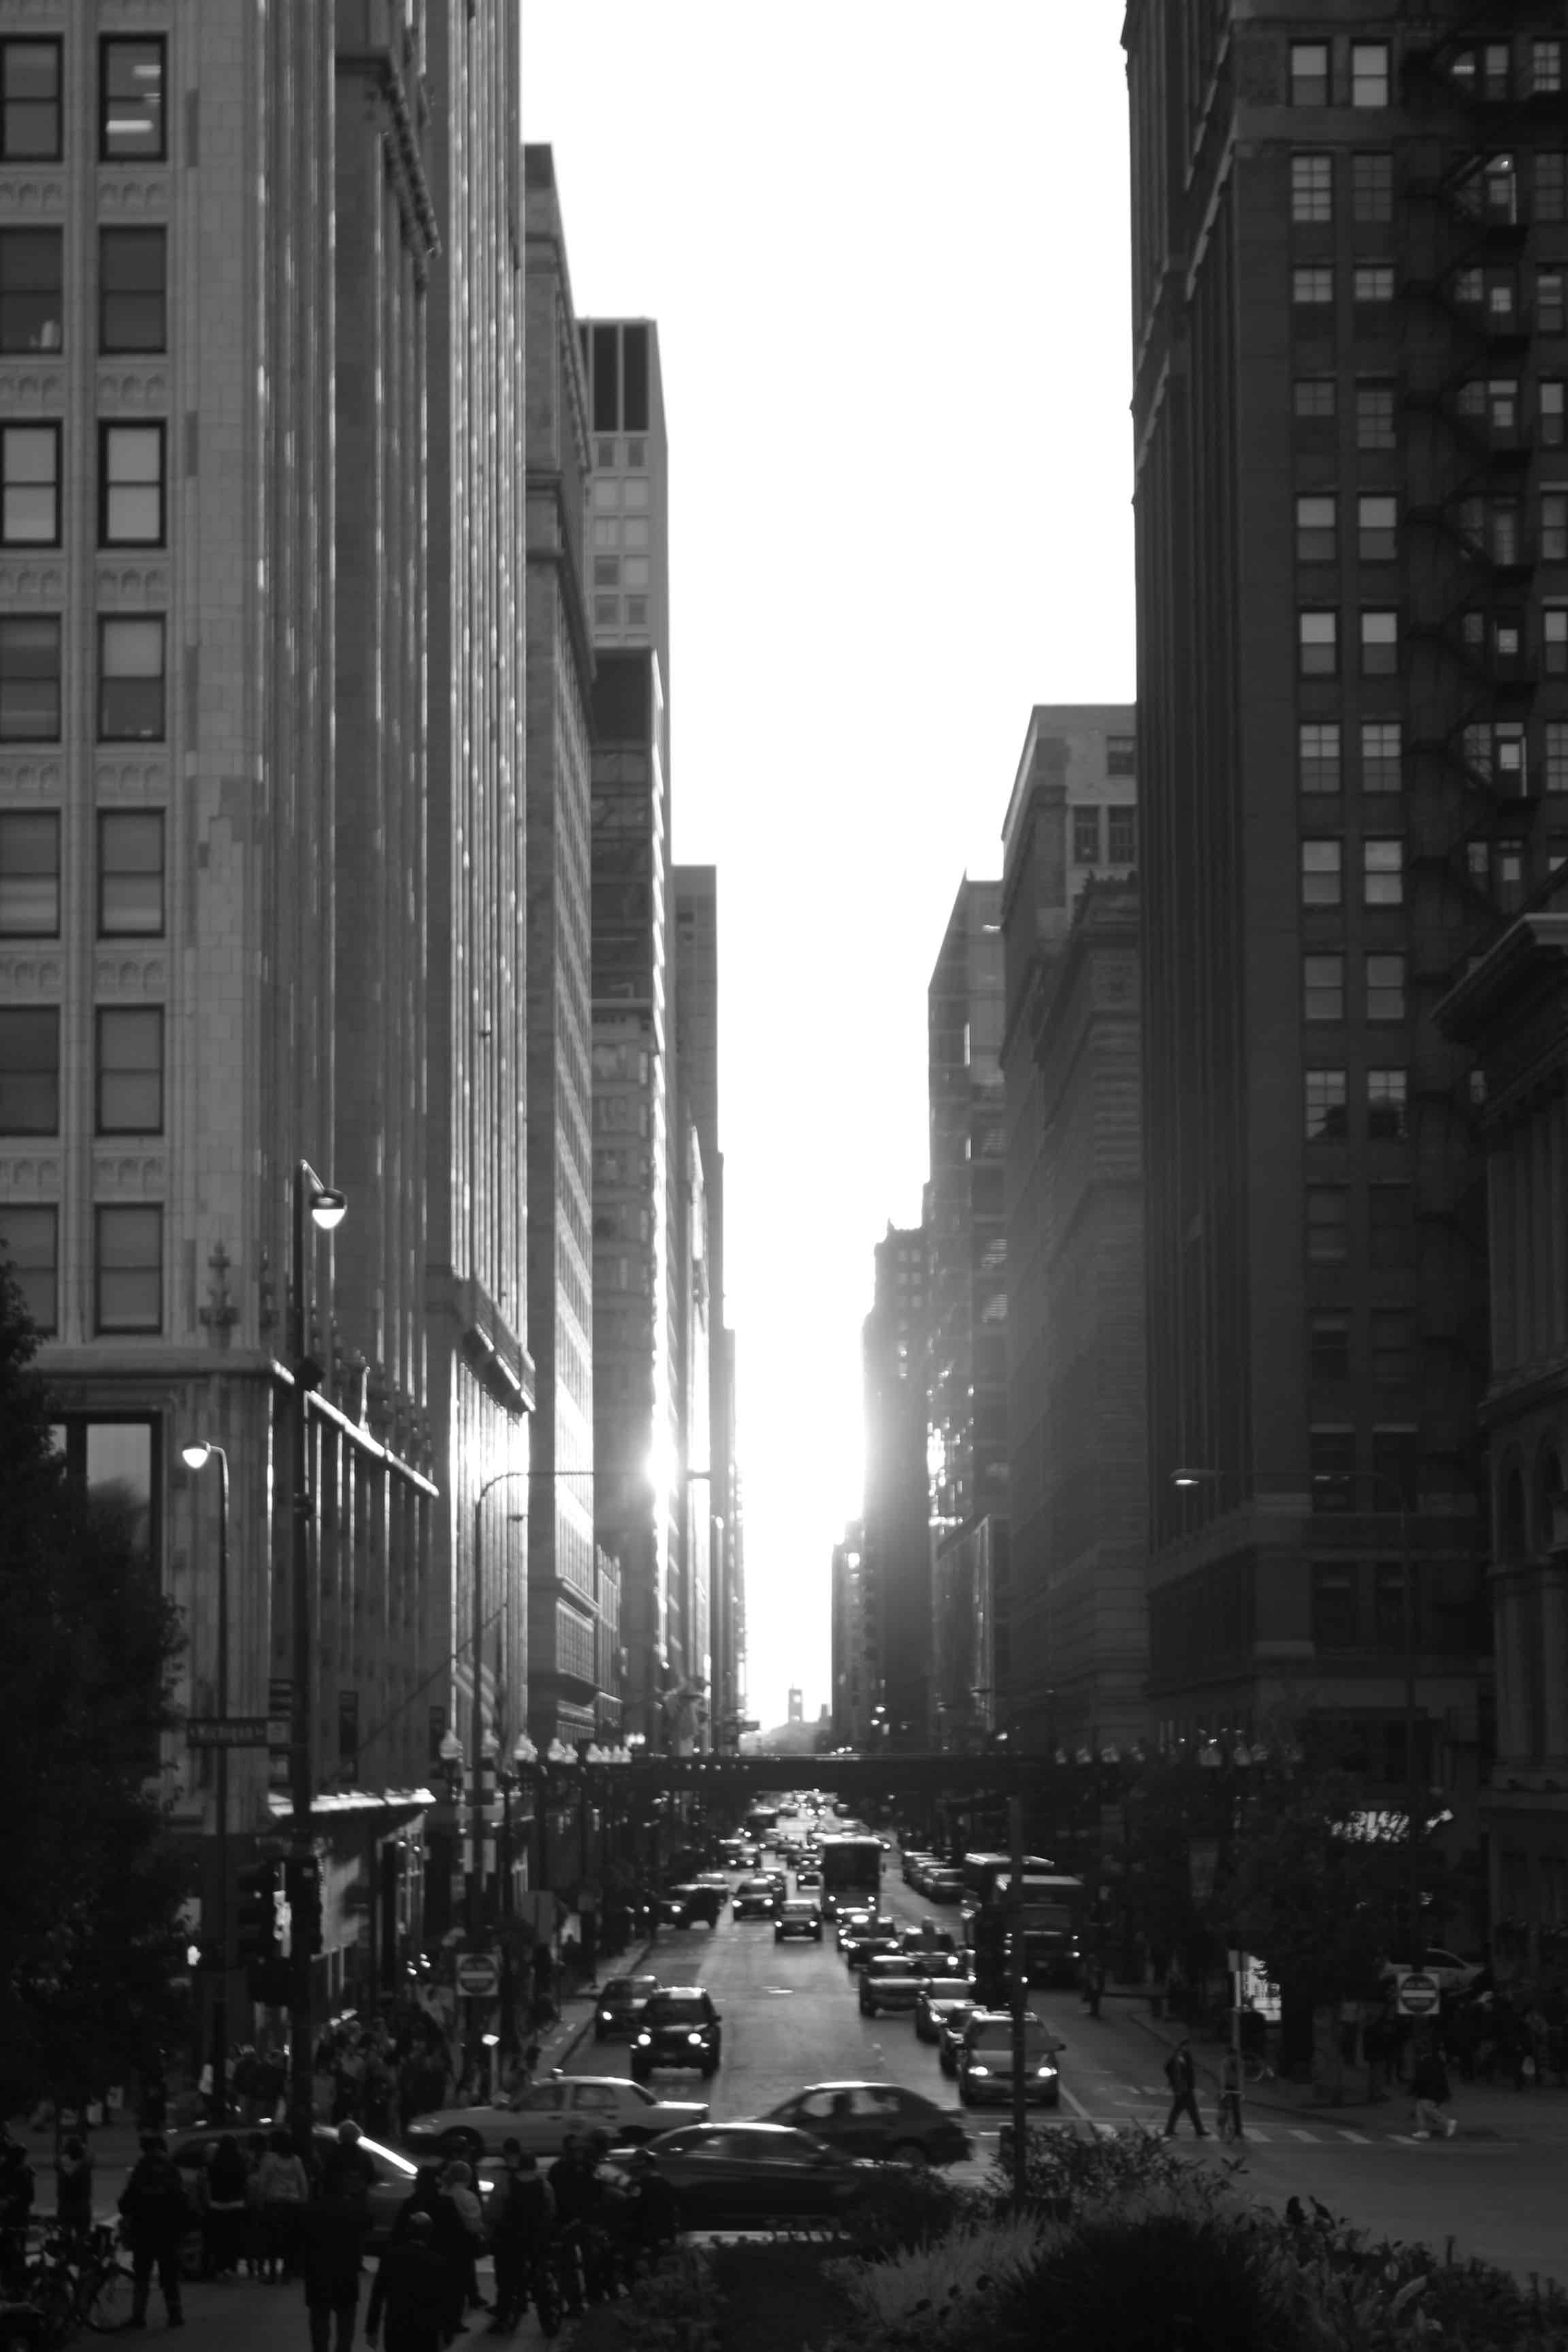 Chicago street at sunrise (black and white)